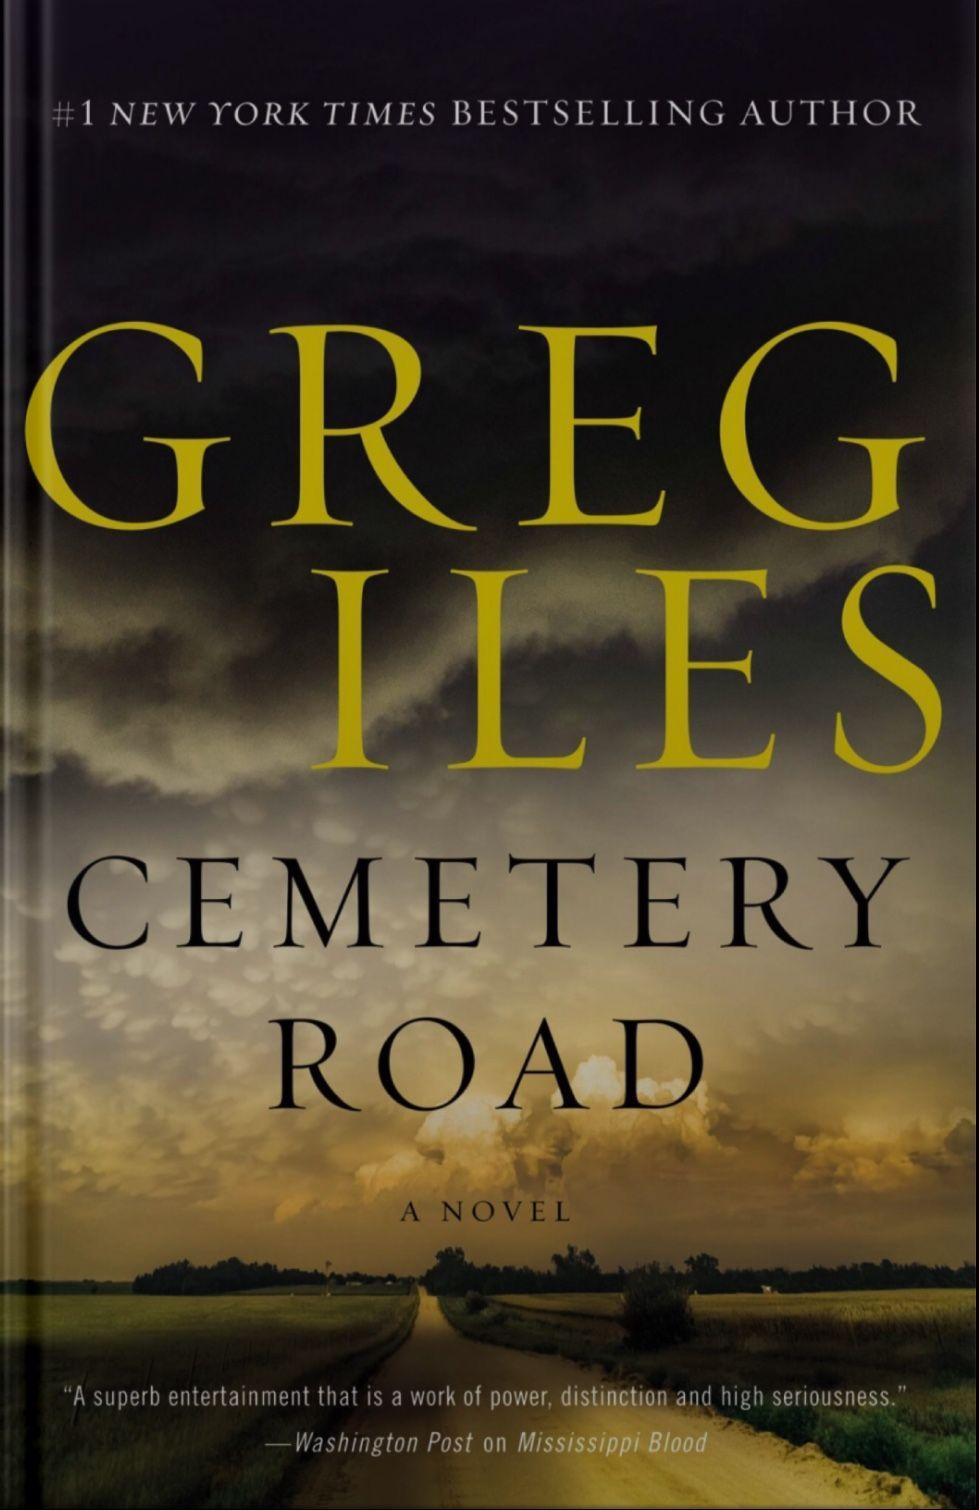 Cemetery road greg iles greg iles books new books novels